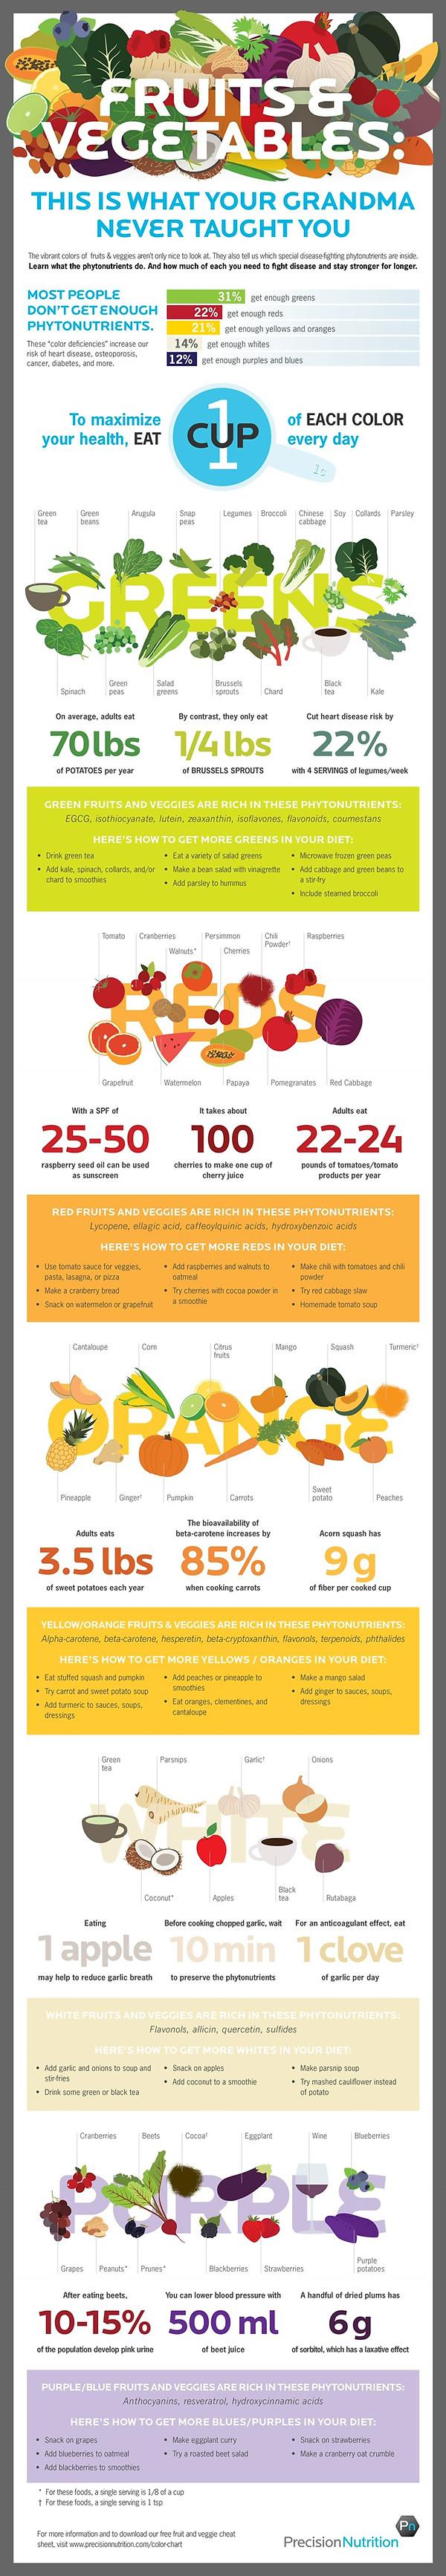 Fruits and Veggies Infograph.jpeg